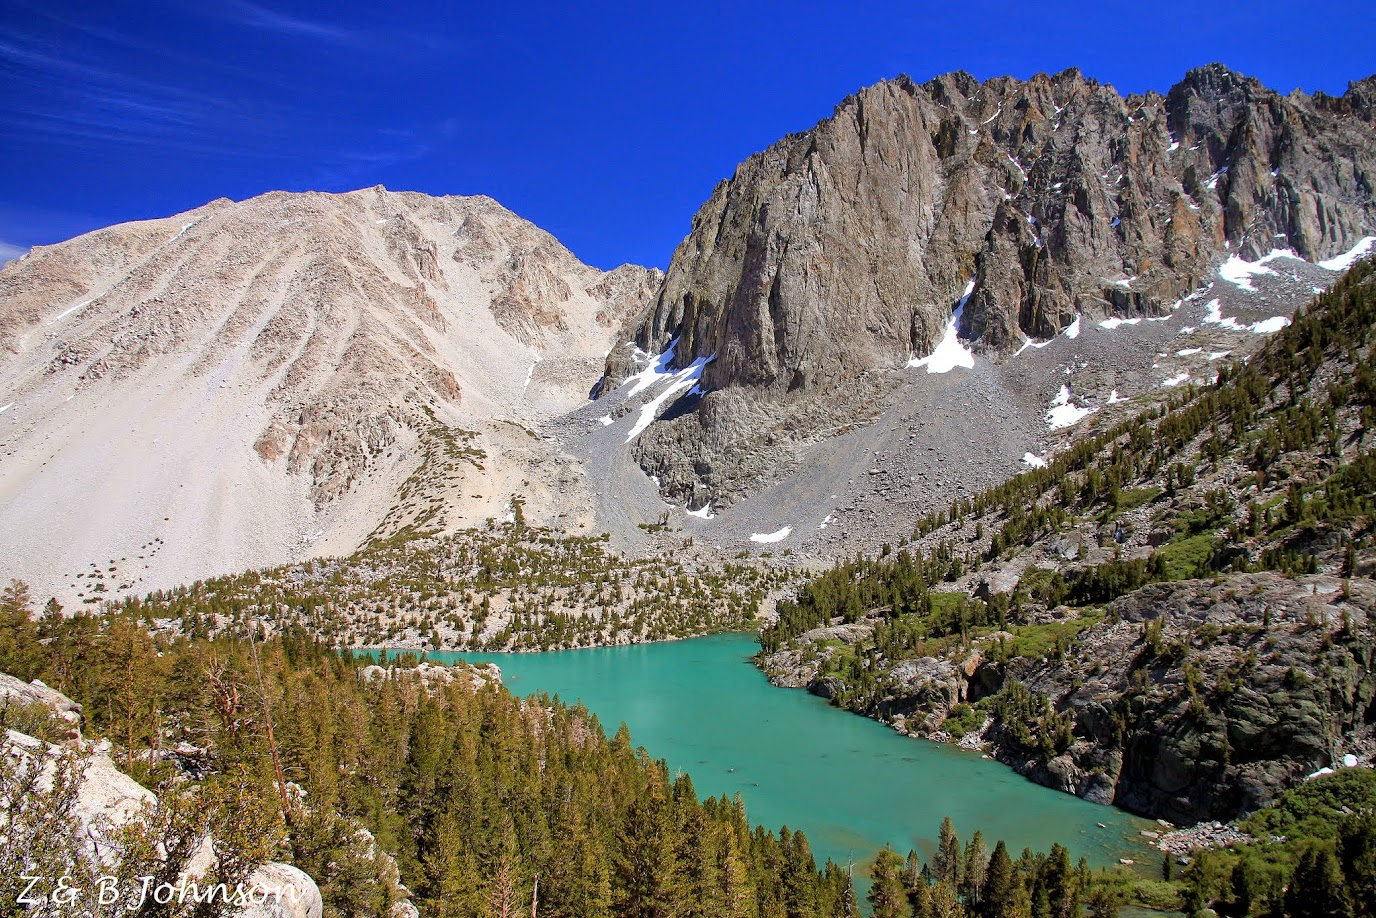 Big Pine Lakes - Z & B Johnson's Adventures